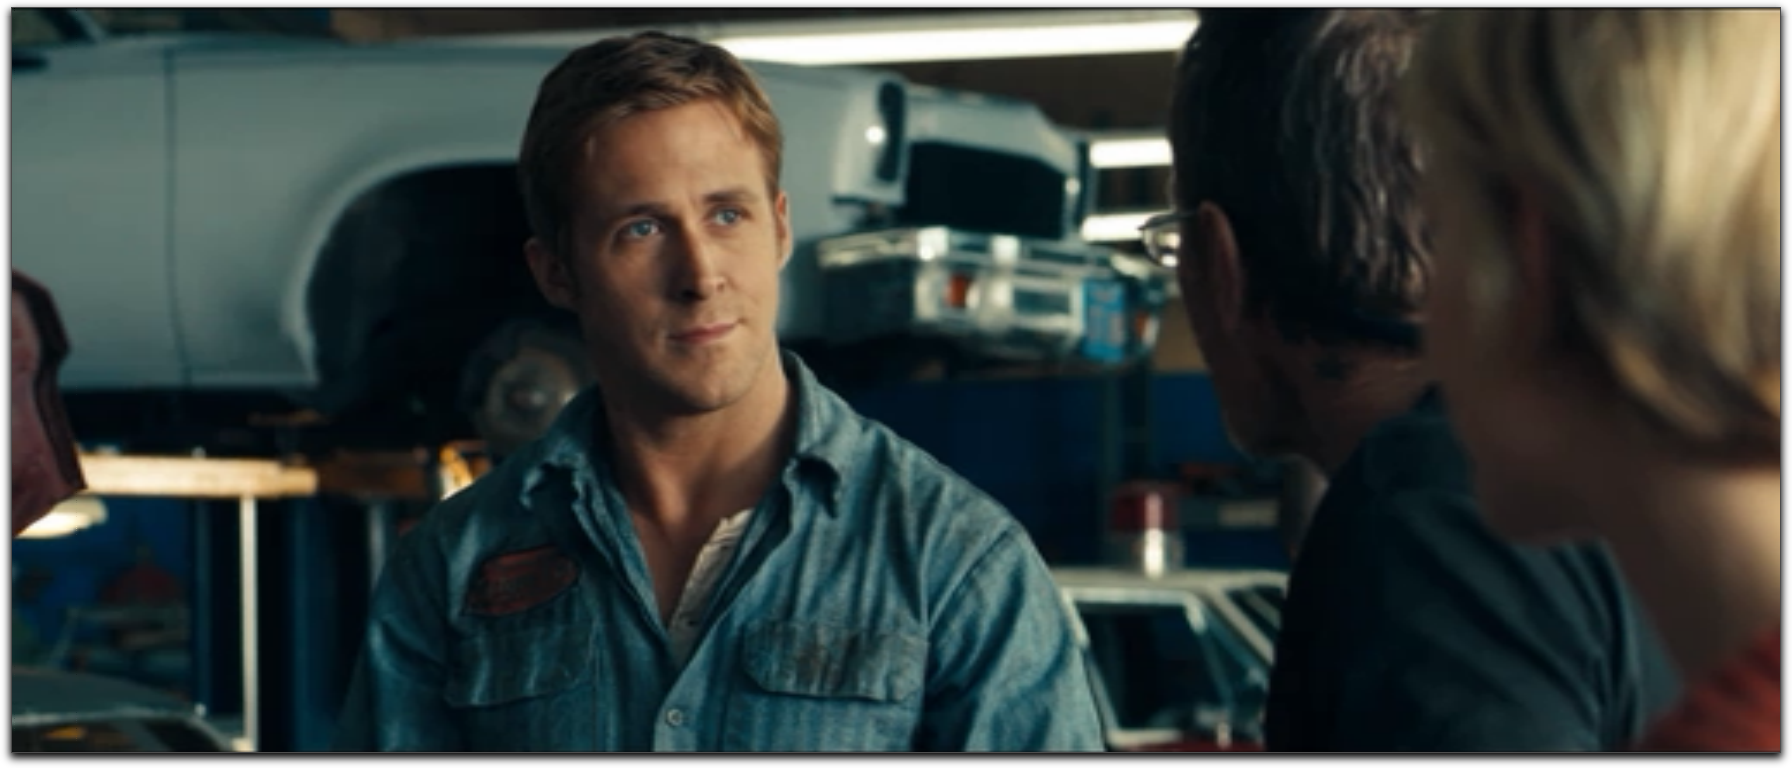 Driving gloves like ryan gosling - Ryan Gosling Drive Coveralls